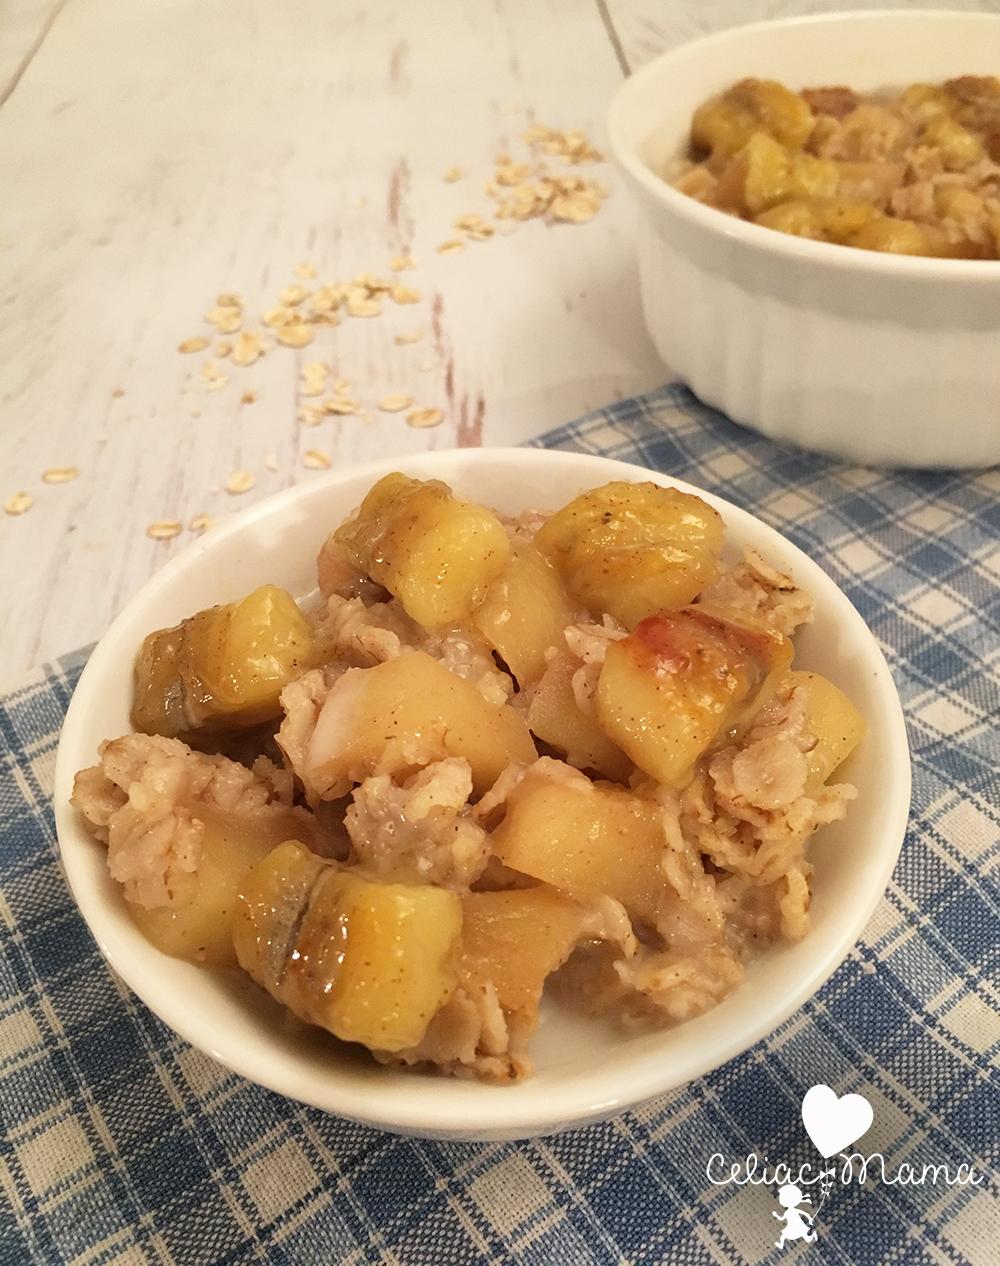 sauteed-banana-apple-gluten-free-oatmeal